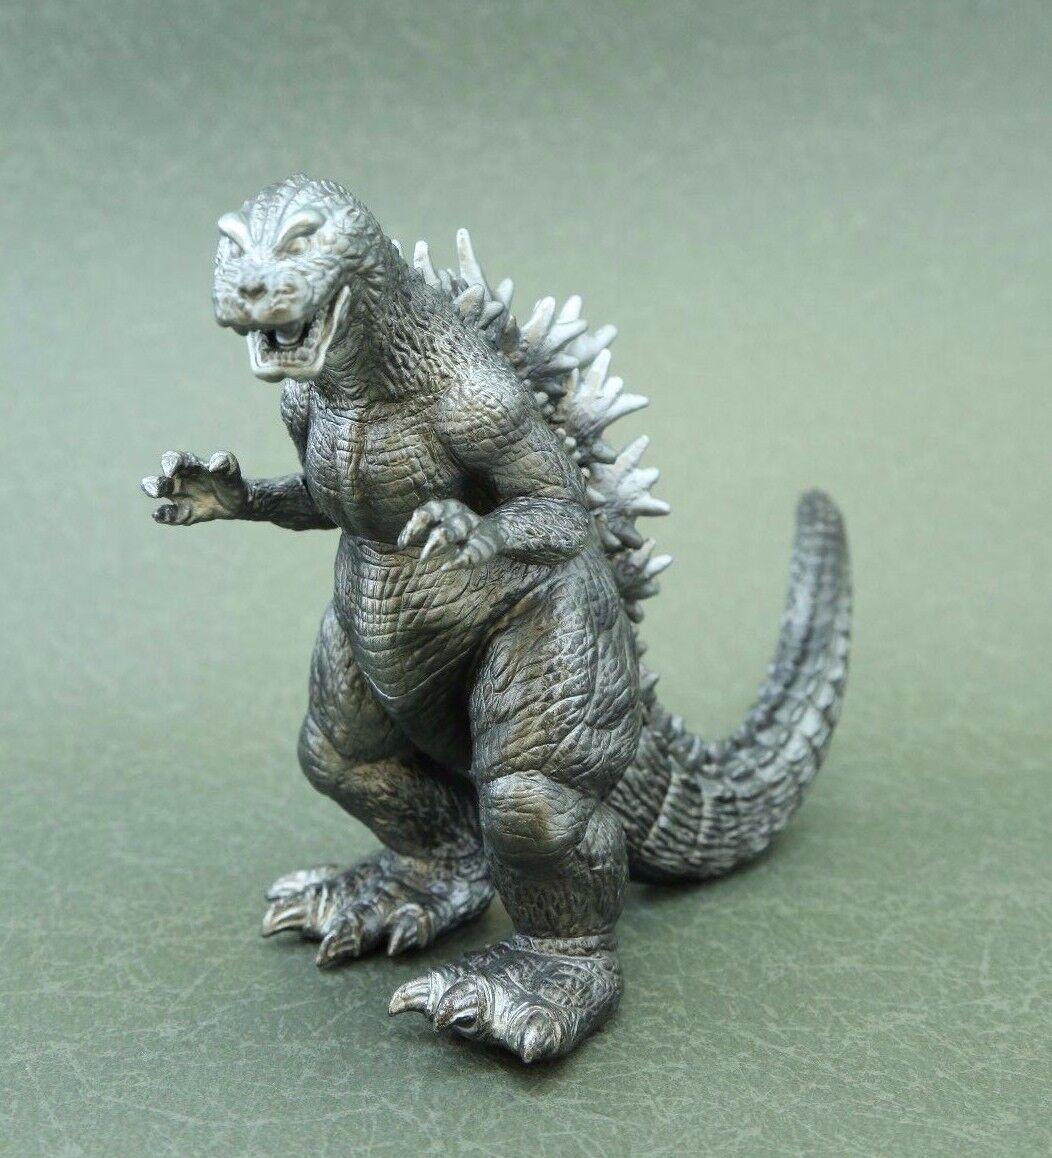 X-plus Toho series monstruo Godzilla personaje authentic 6.5  Toho Japón